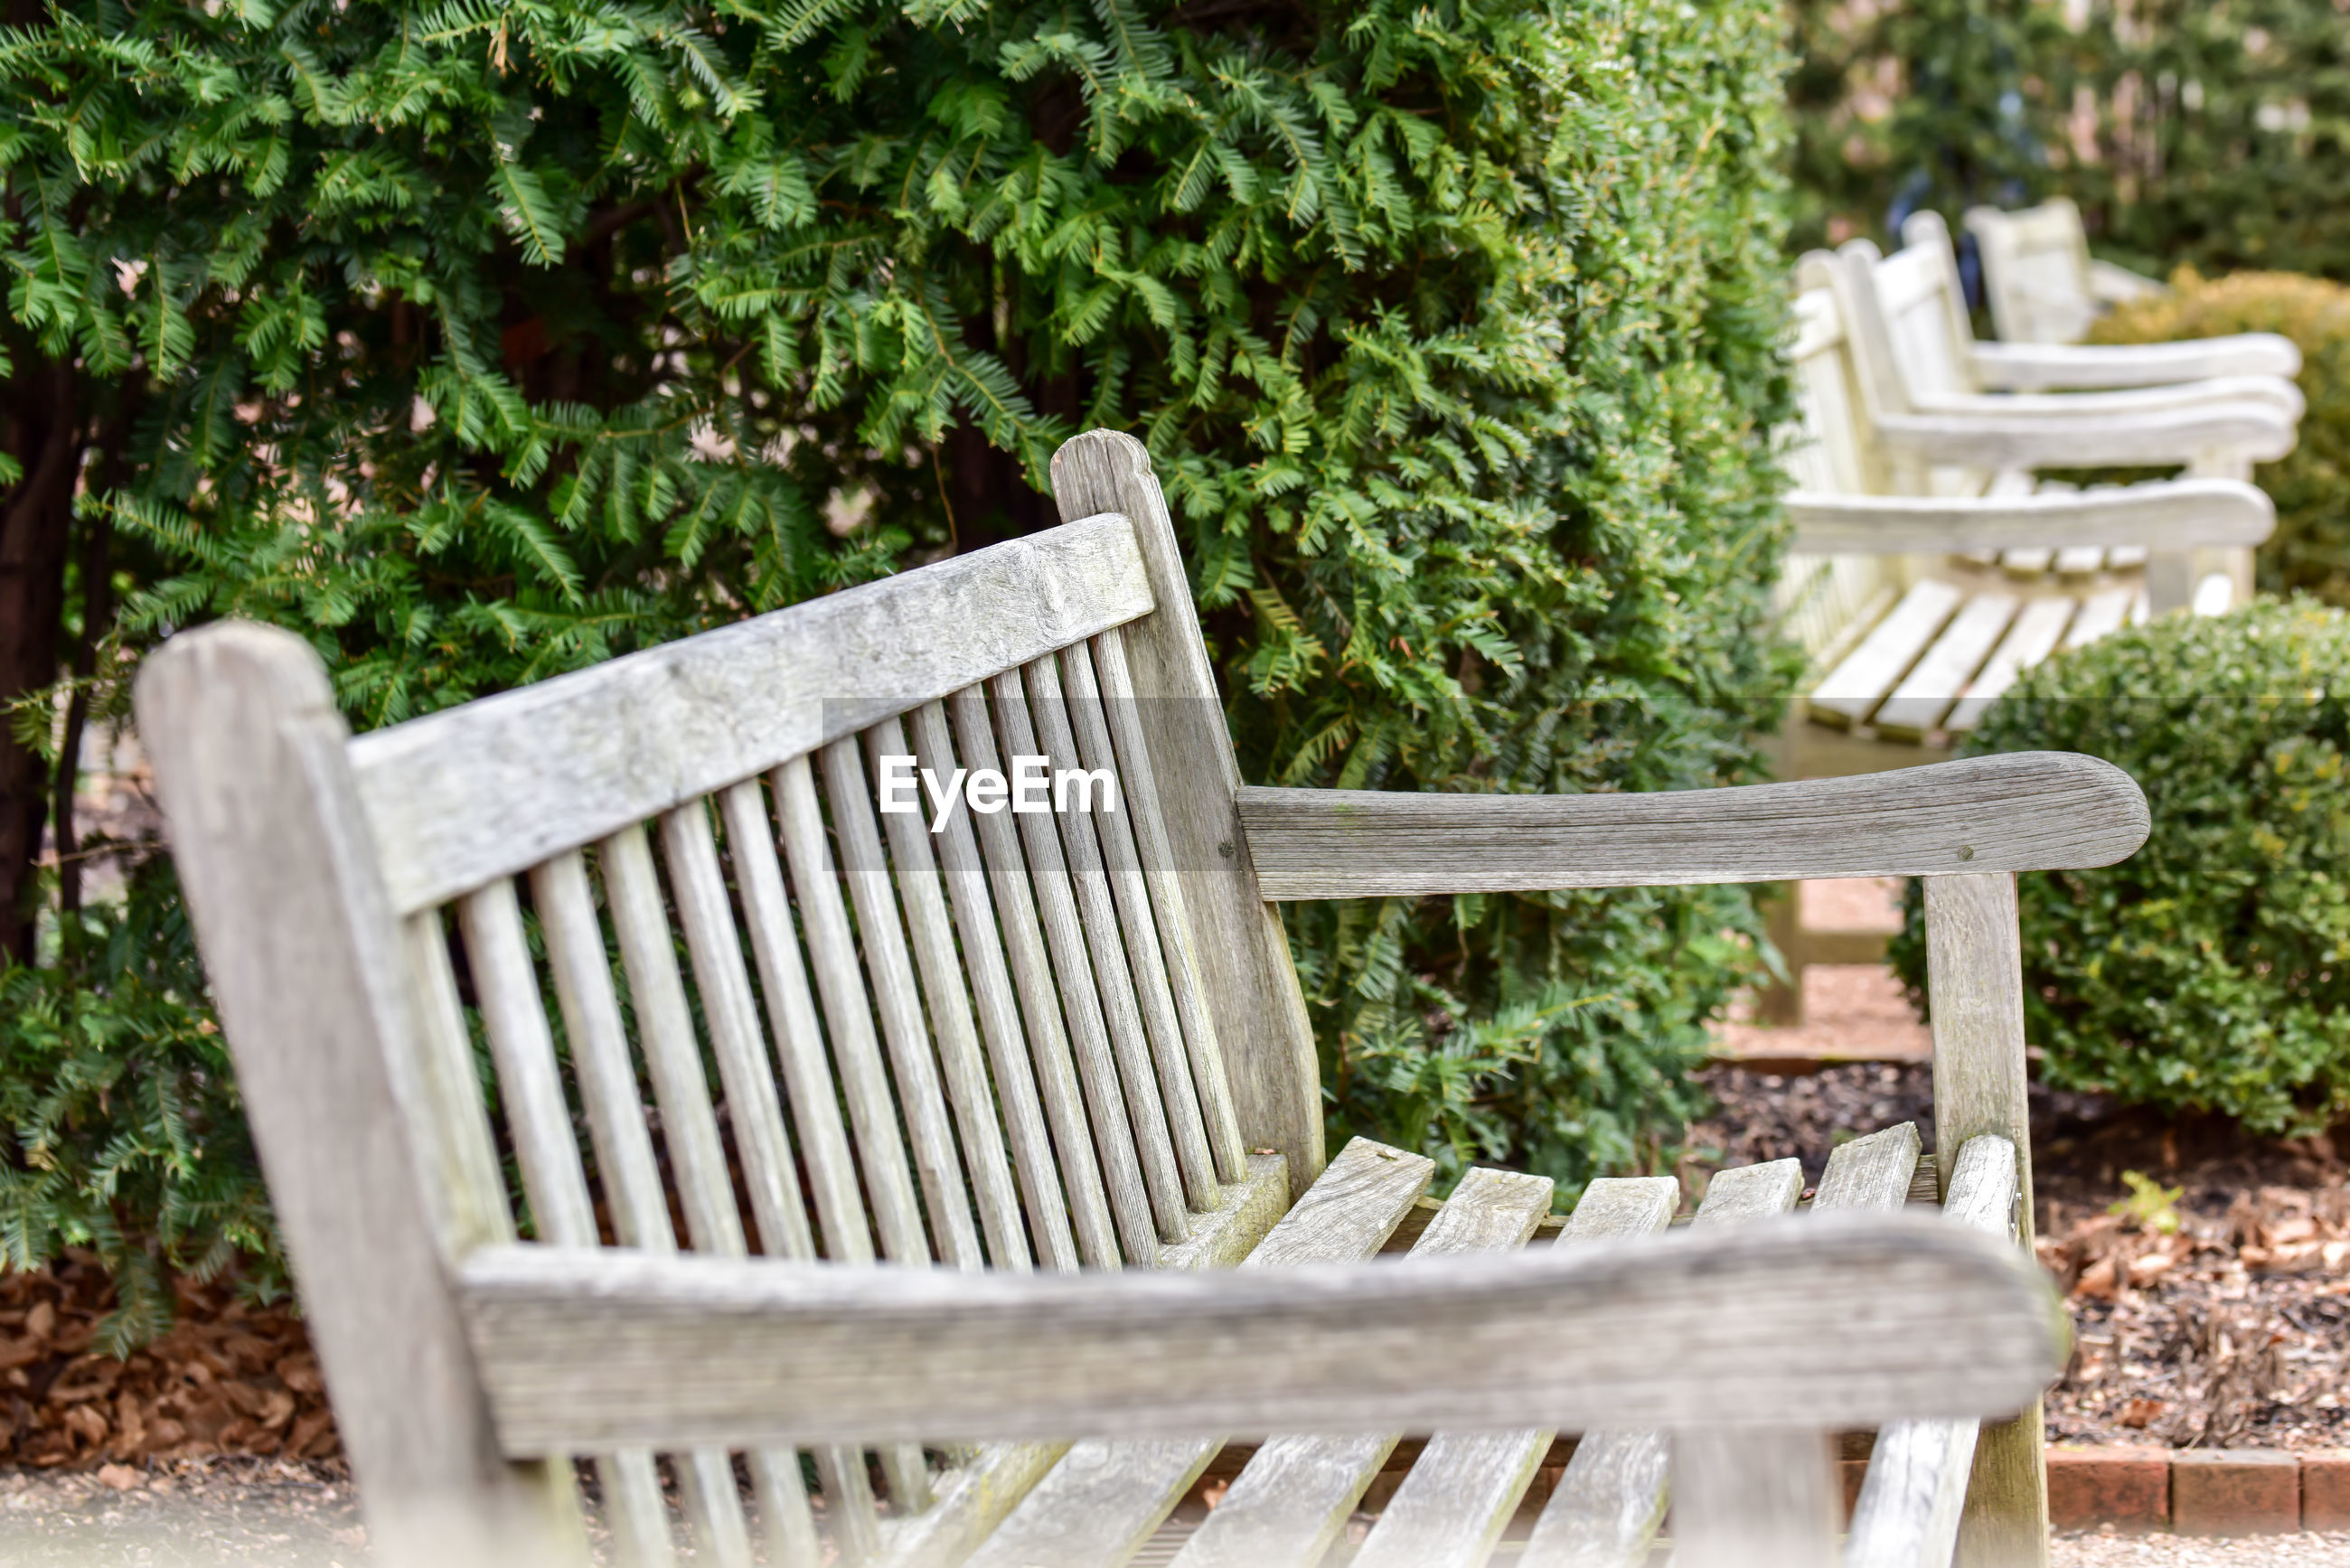 Empty bench in garden